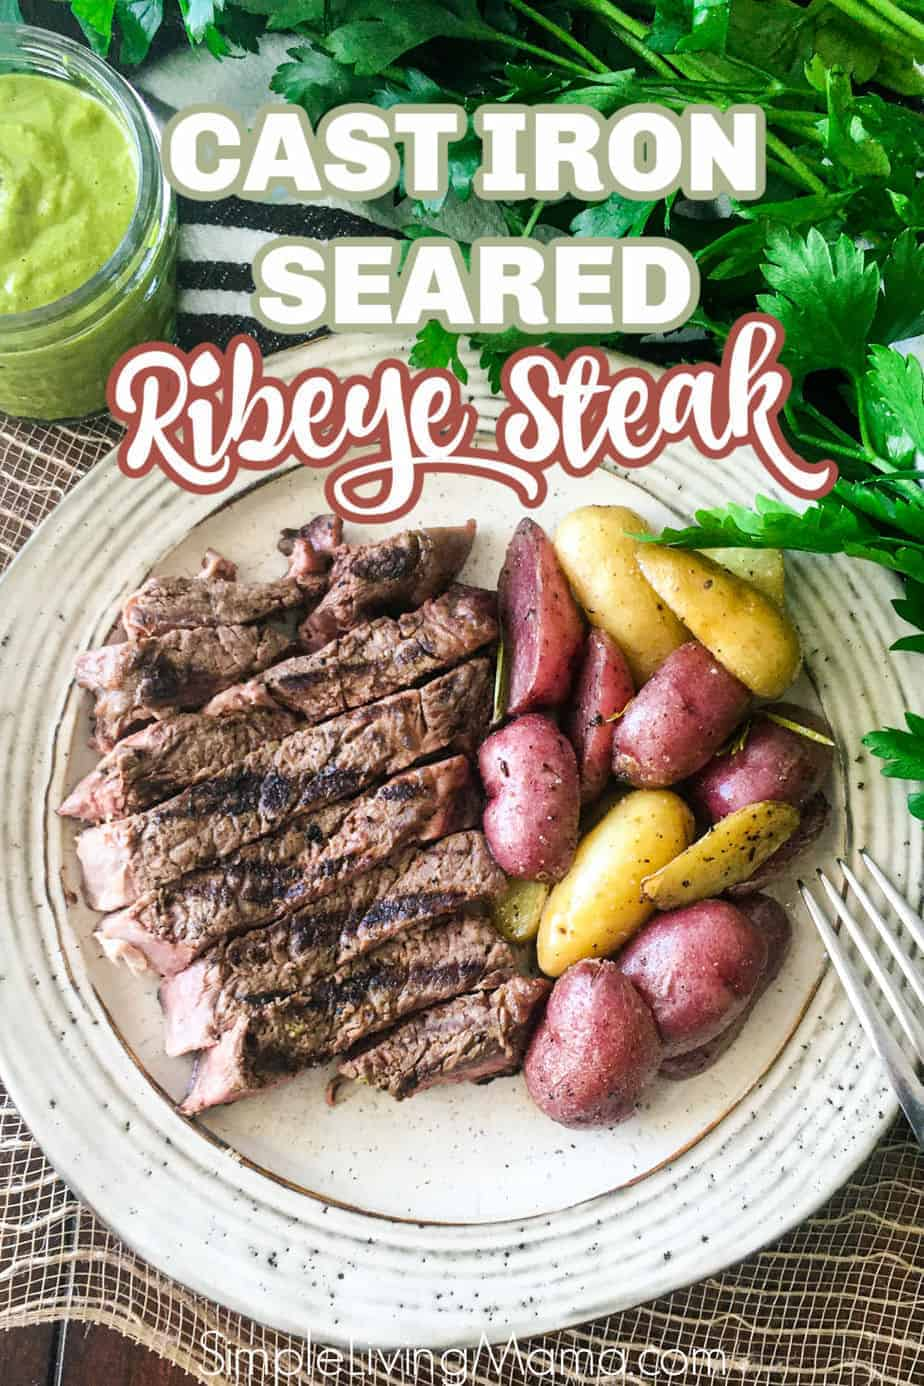 A delicious cast iron seared ribeye steak served alongside roasted potatoes.